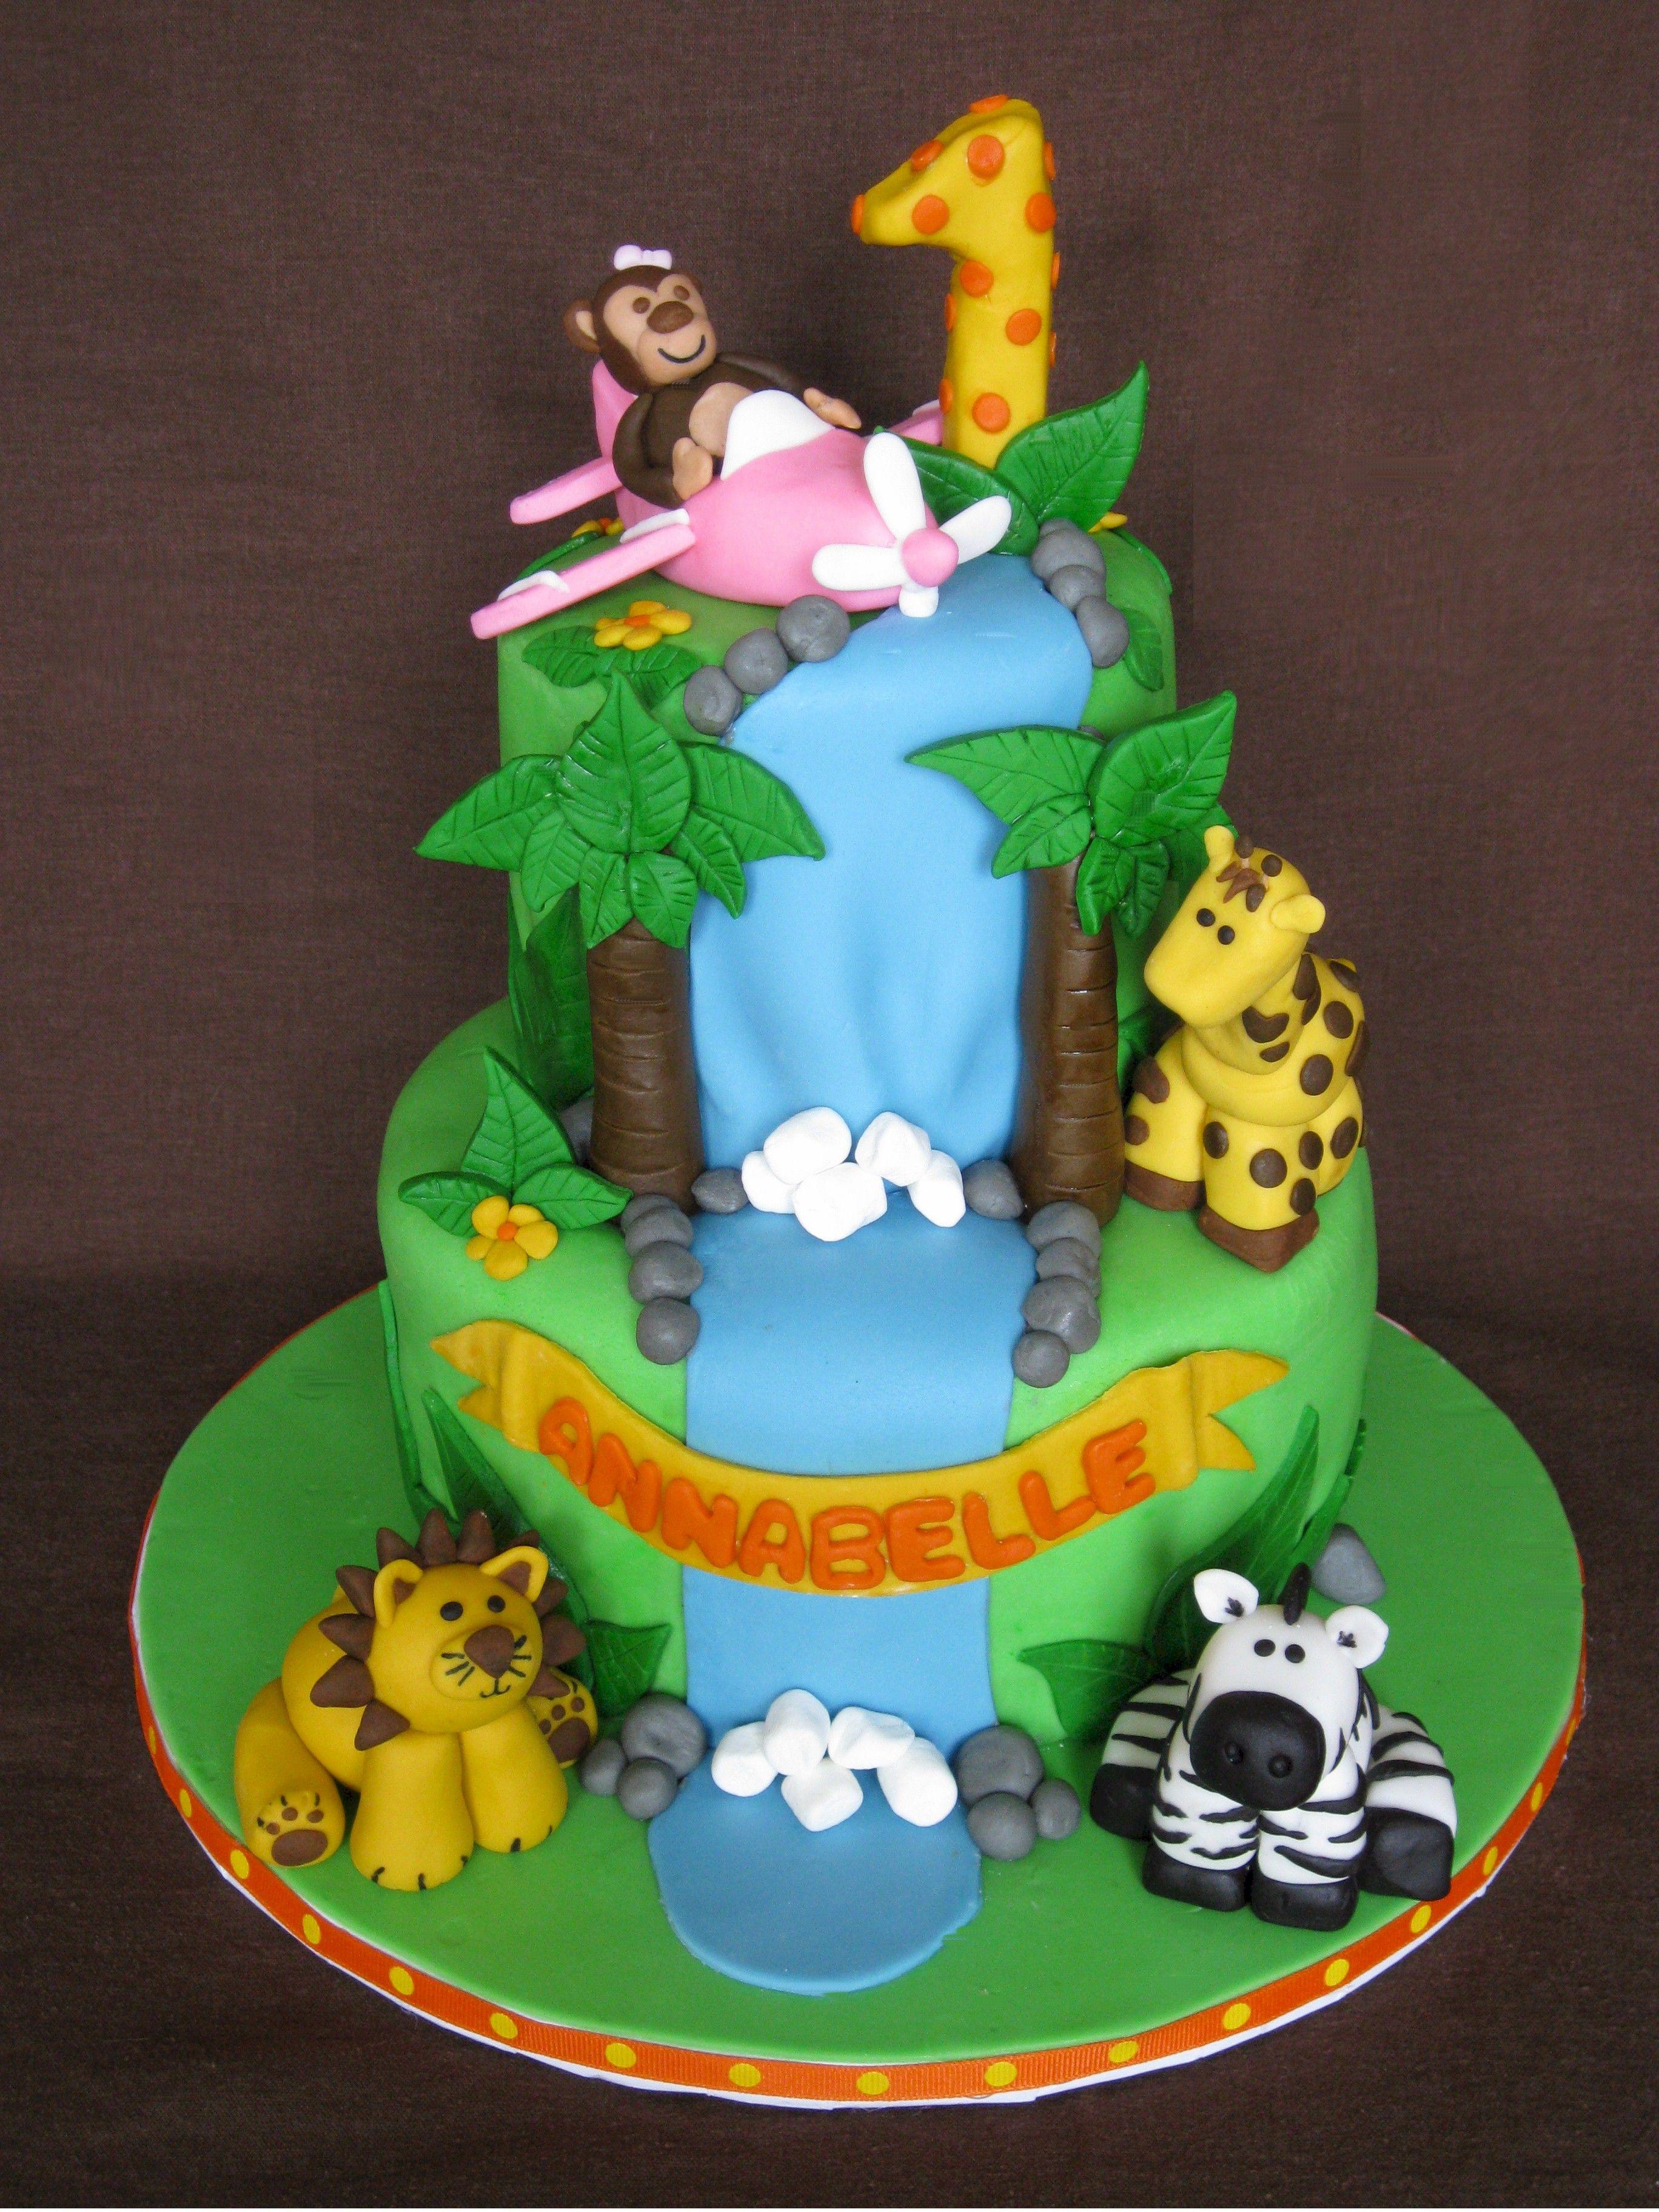 jungle birthday cake birthday cakes beautiful and sweet on jungle birthday cake design